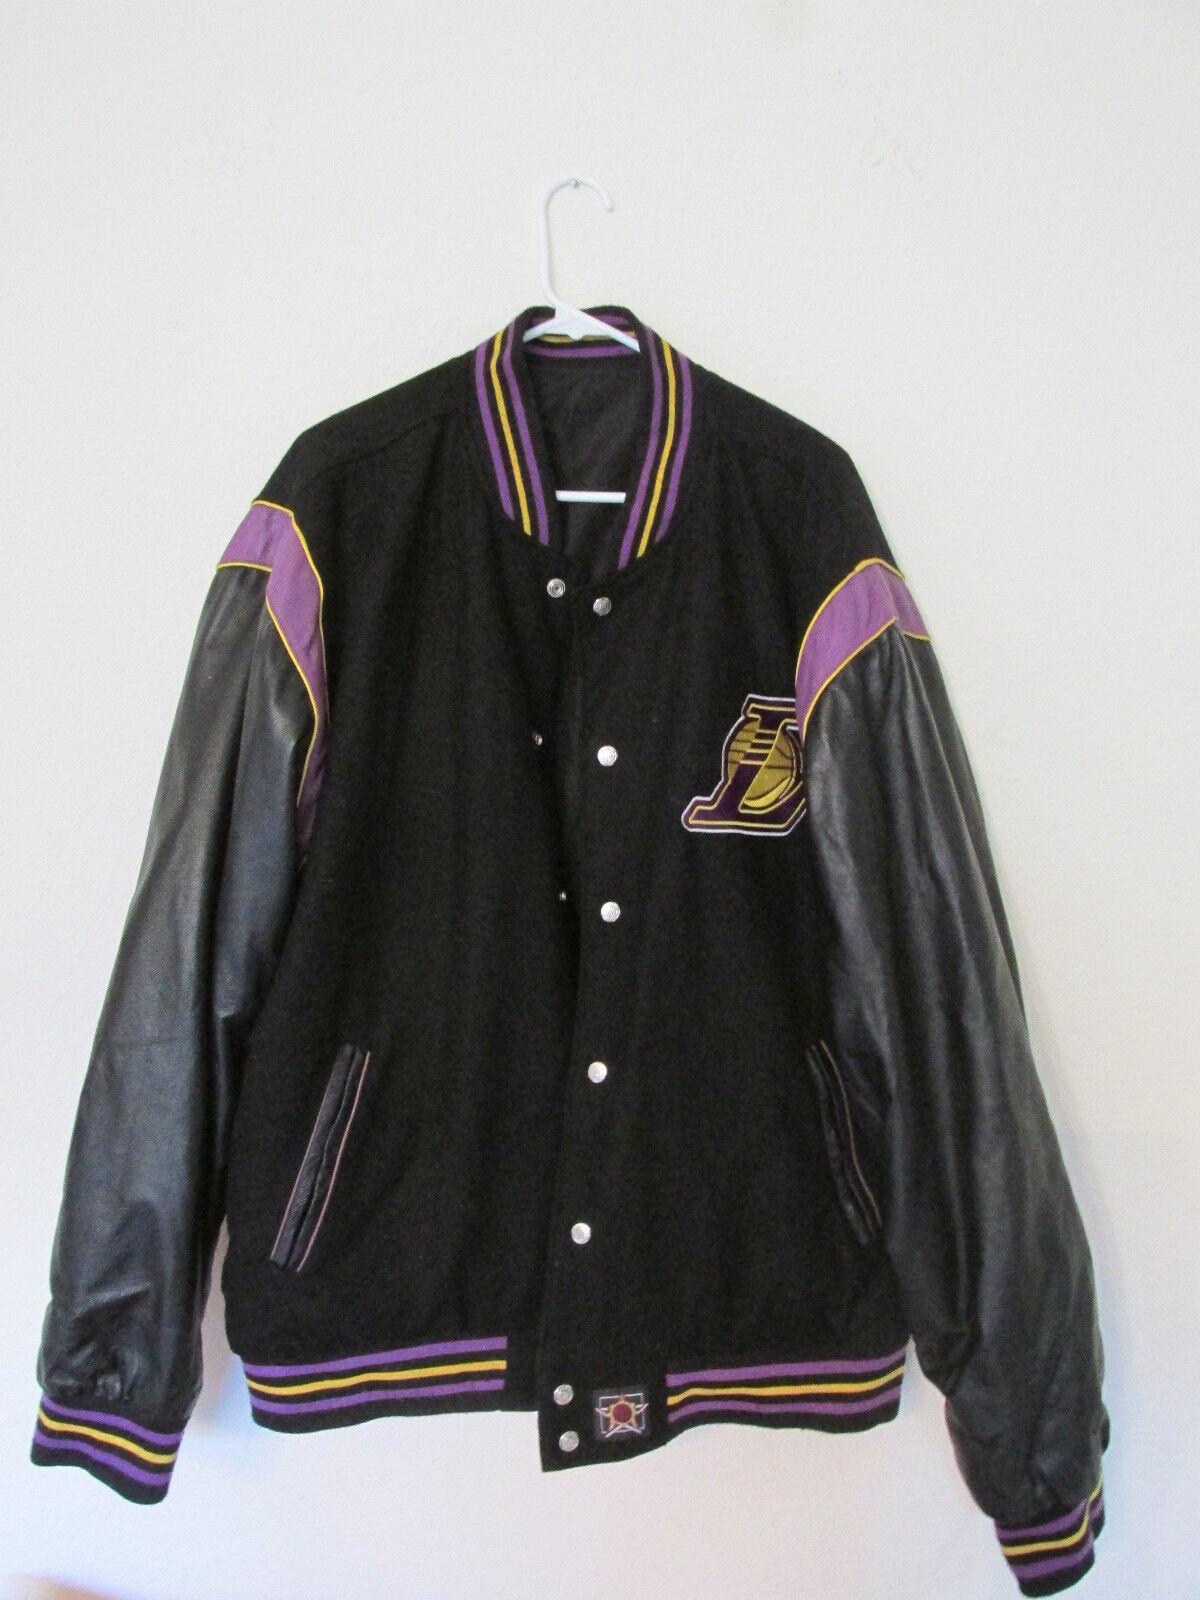 HERREN Jh Jh Jh Design La Los Angeles Lakers Leder & Wolle Wendejacke Mantel 3X 128d15